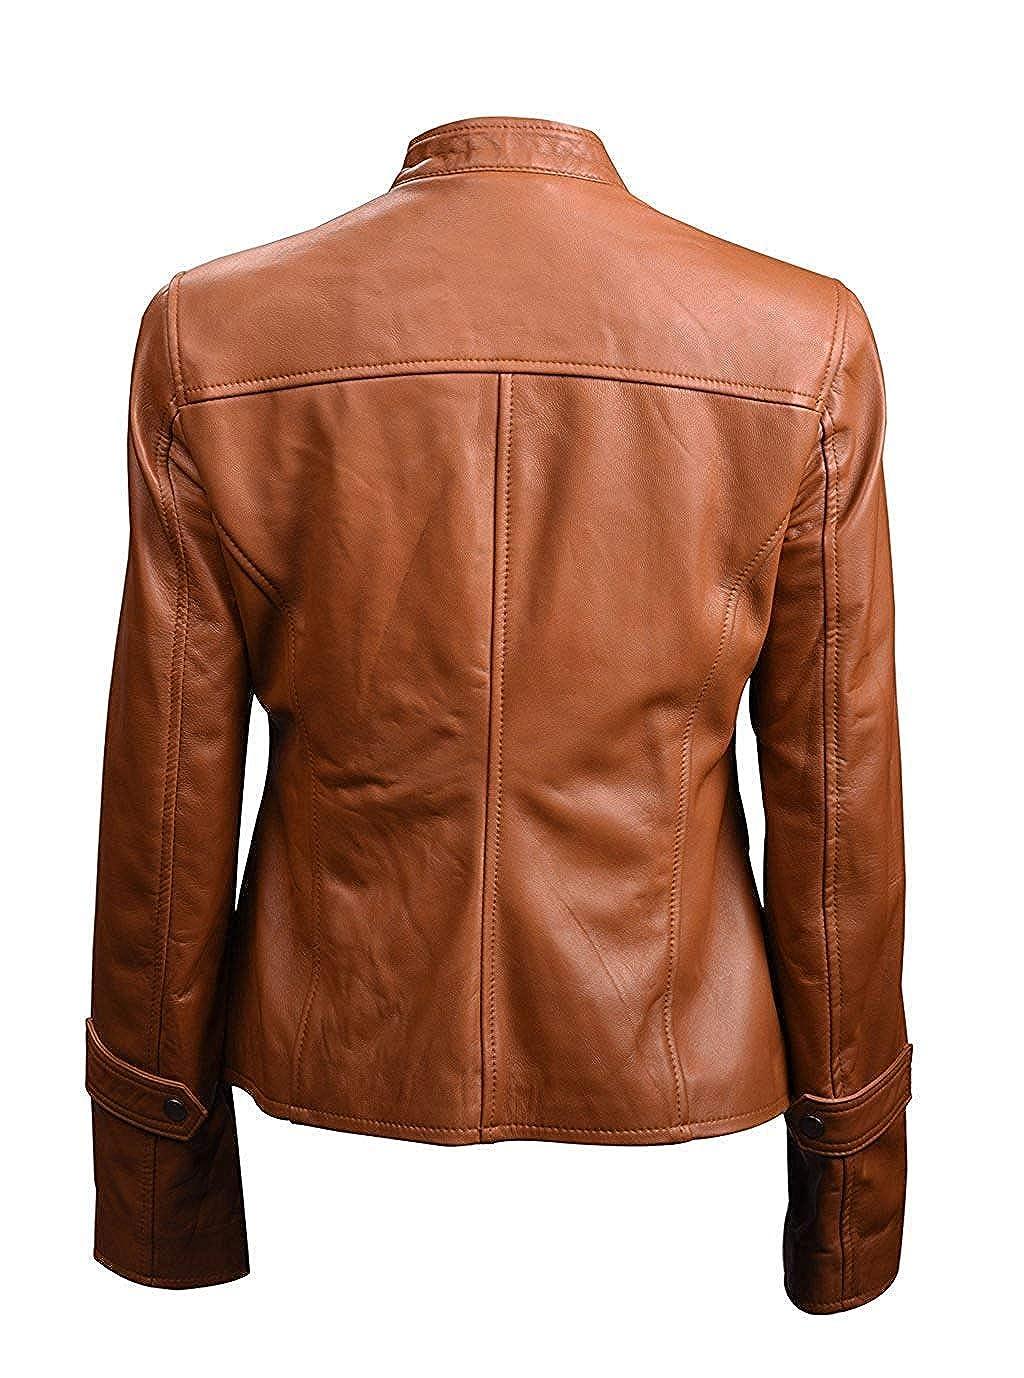 Womens Missy Franklin Biker Slim Fit Tan Brown Real Leather Jacket